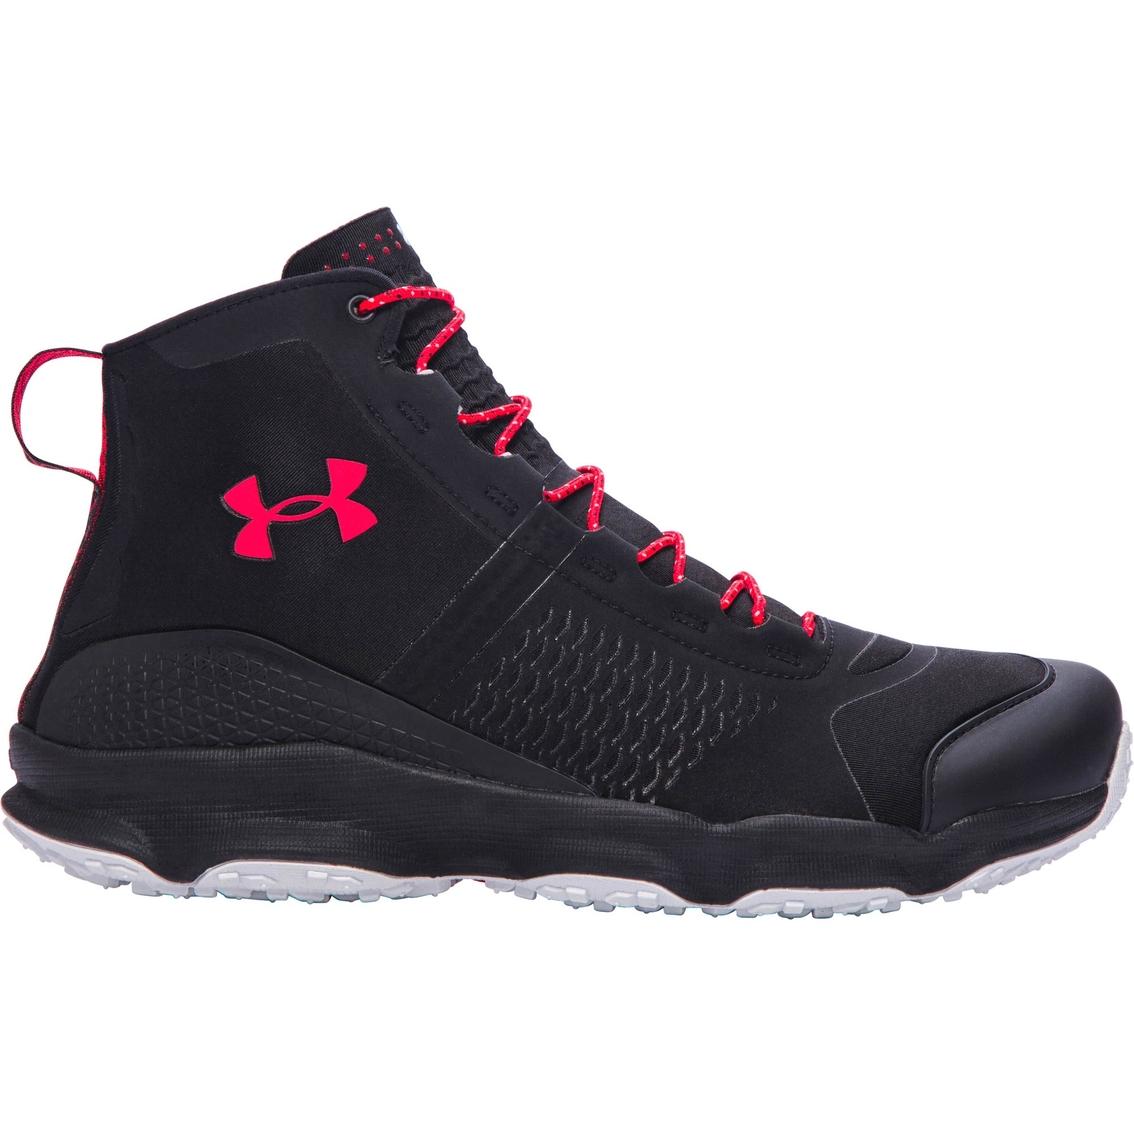 Under Armour Men's Ua Speedfit Mid Trail Running Shoes